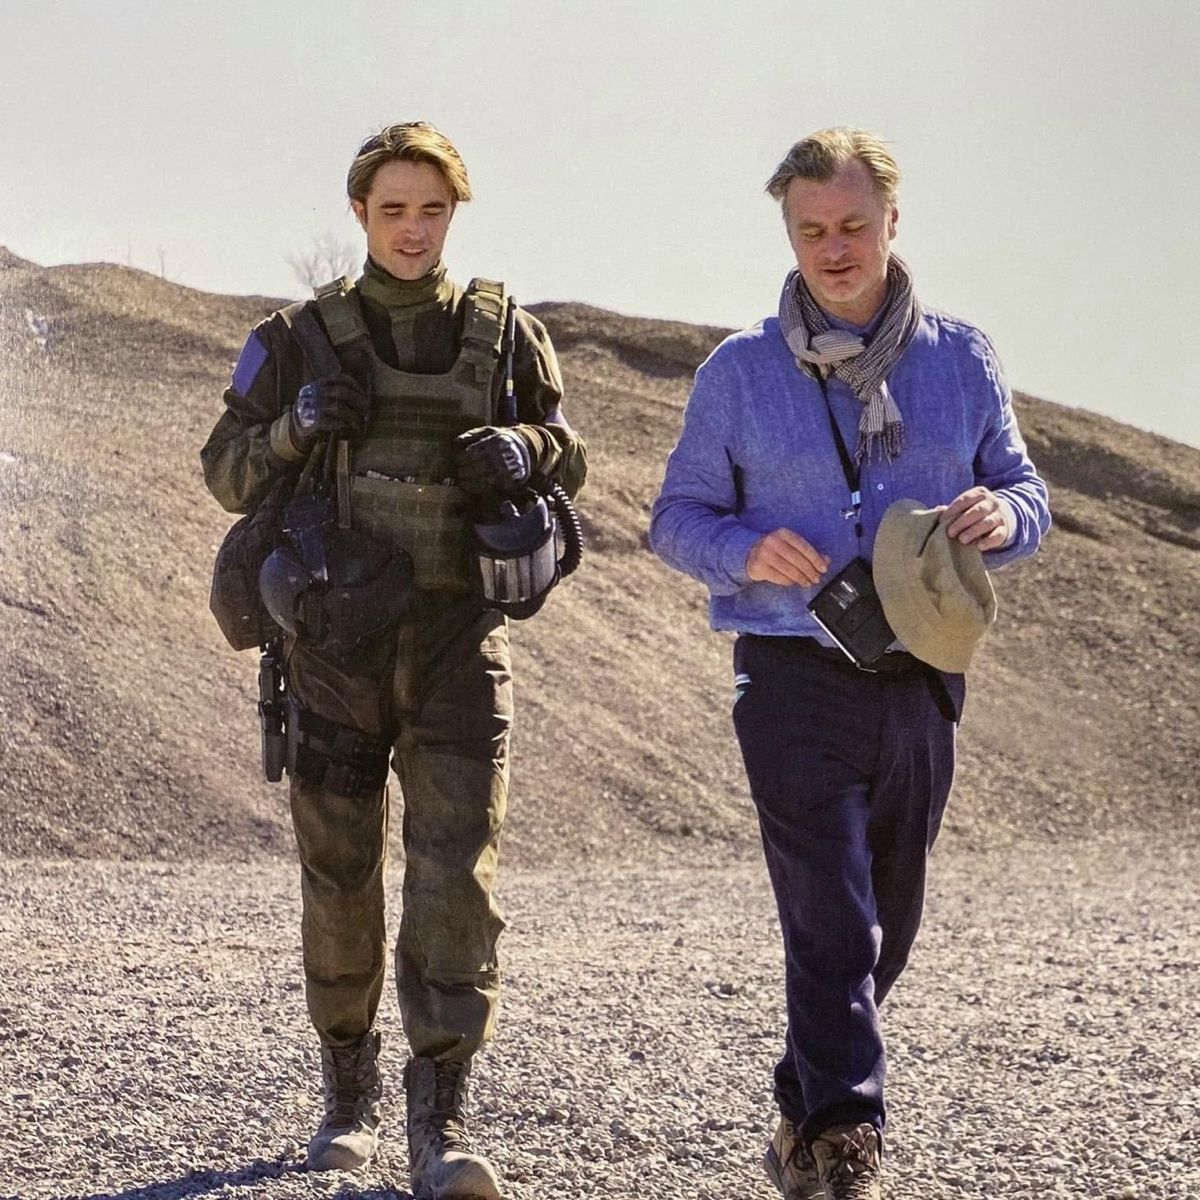 Pin By Mariana Barbaric On Robert Pattinson In 2020 Robert Pattinson Christopher Nolan Nolan Film